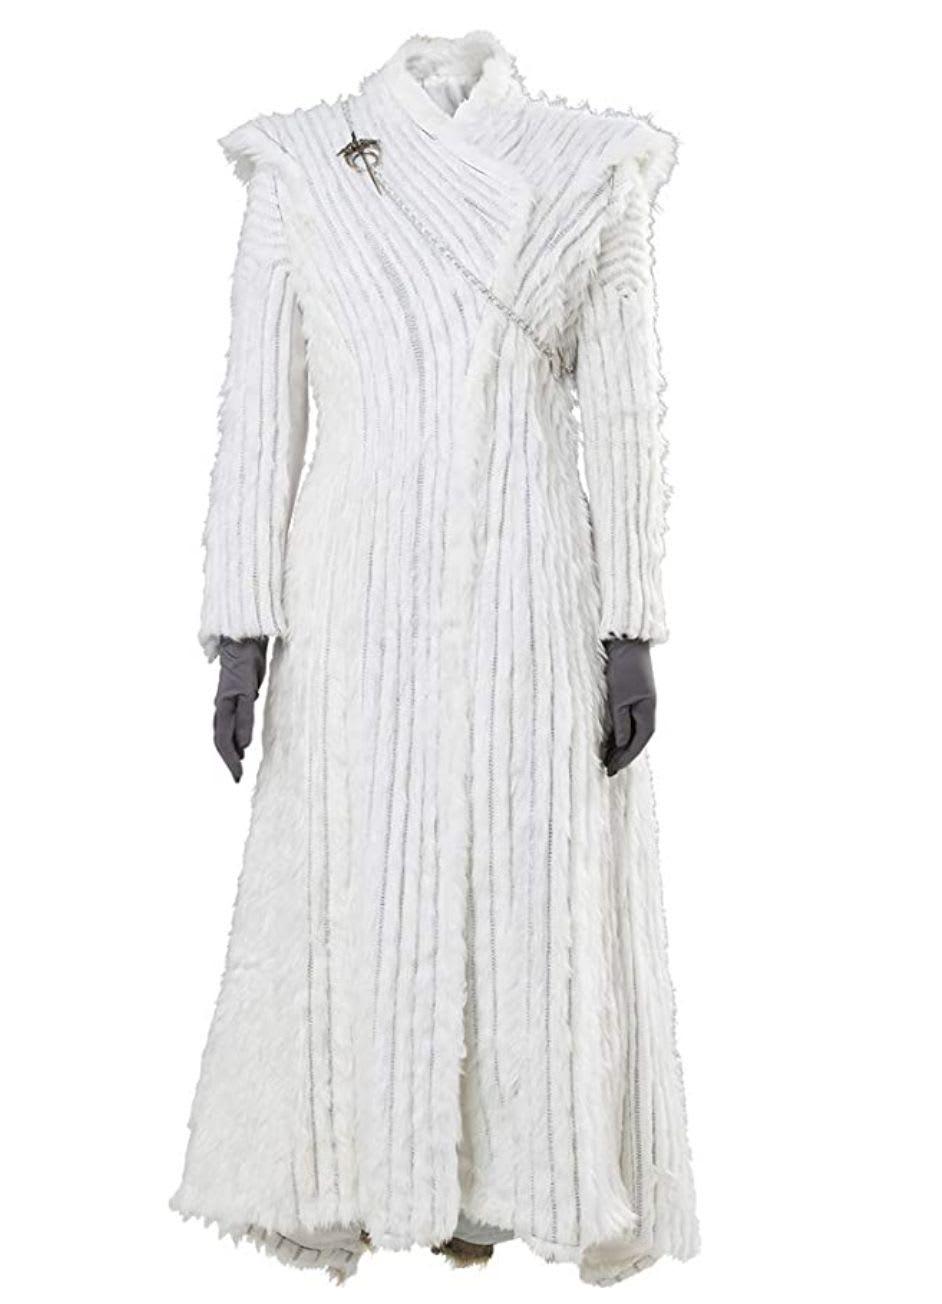 Discover Cosplaysky's Daenerys Targaryen costume on Amazon.